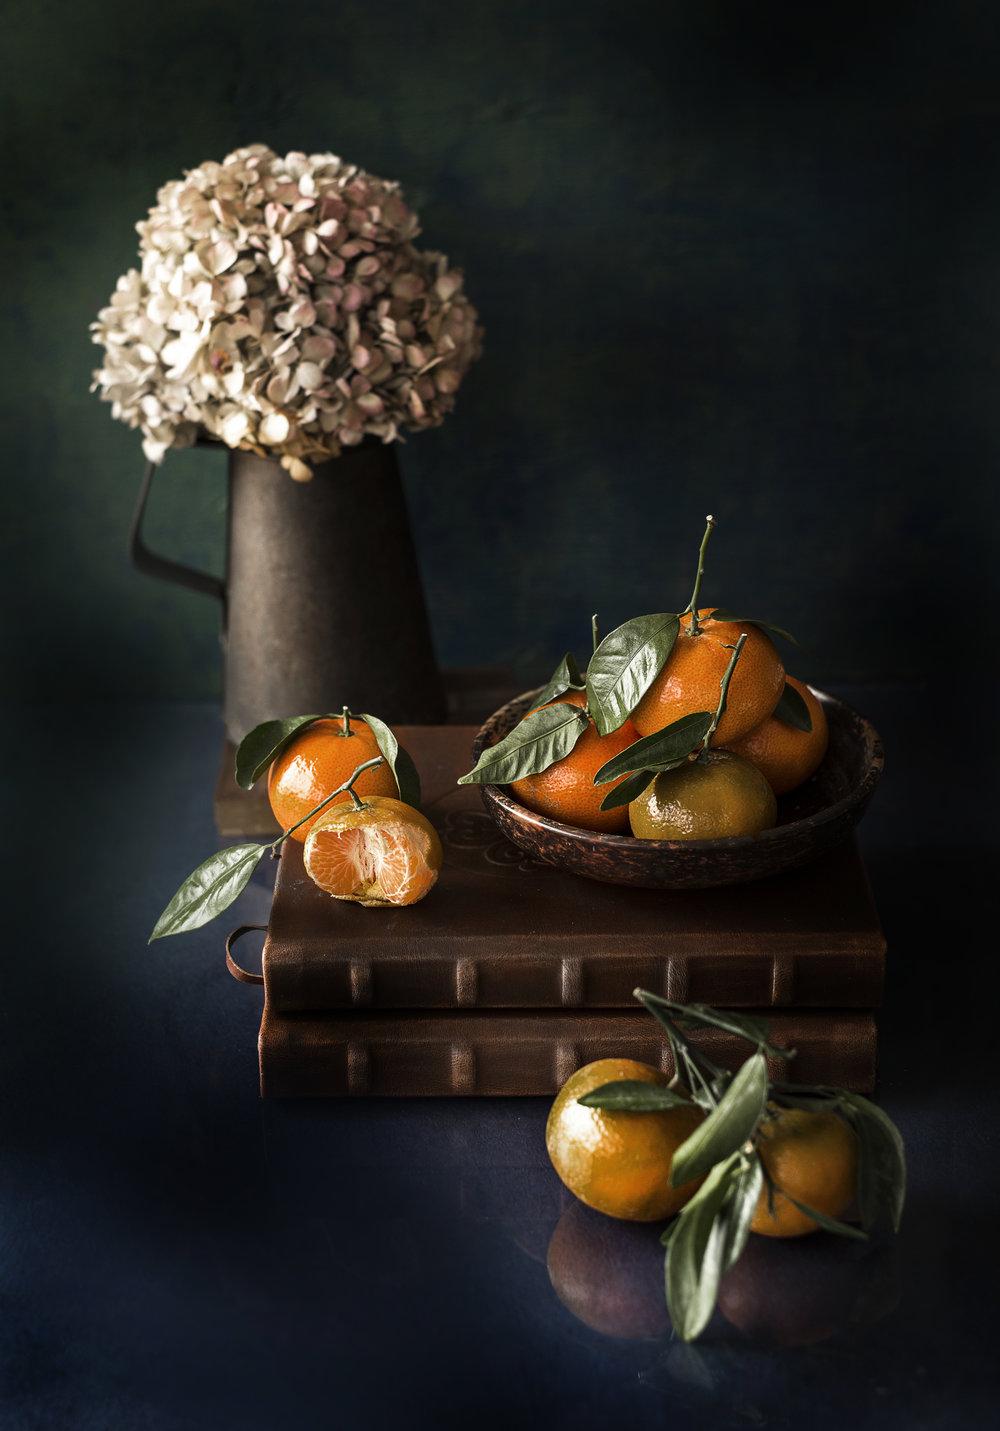 OrangeStillLife-HR-SimiJois-2017.jpg